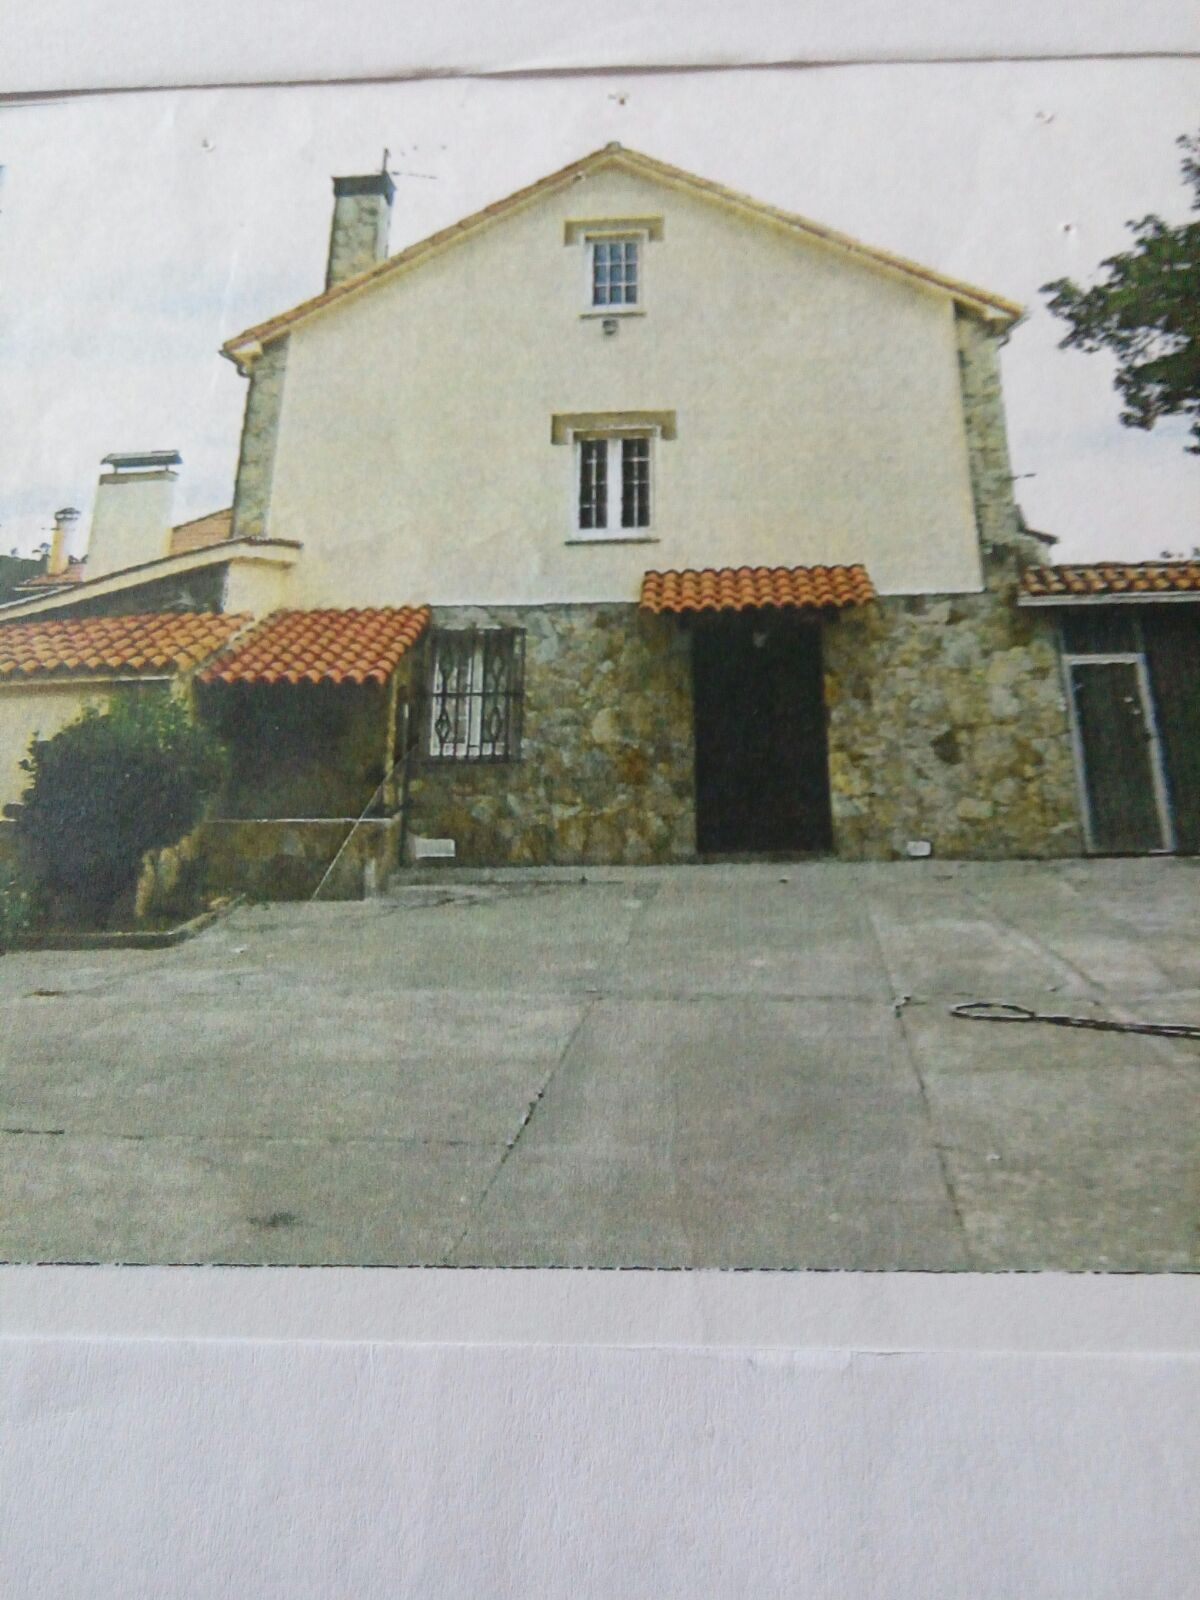 Casa en alquiler zona bergondo coru a dubra xesti n inmobiliaria - Casas en bergondo ...